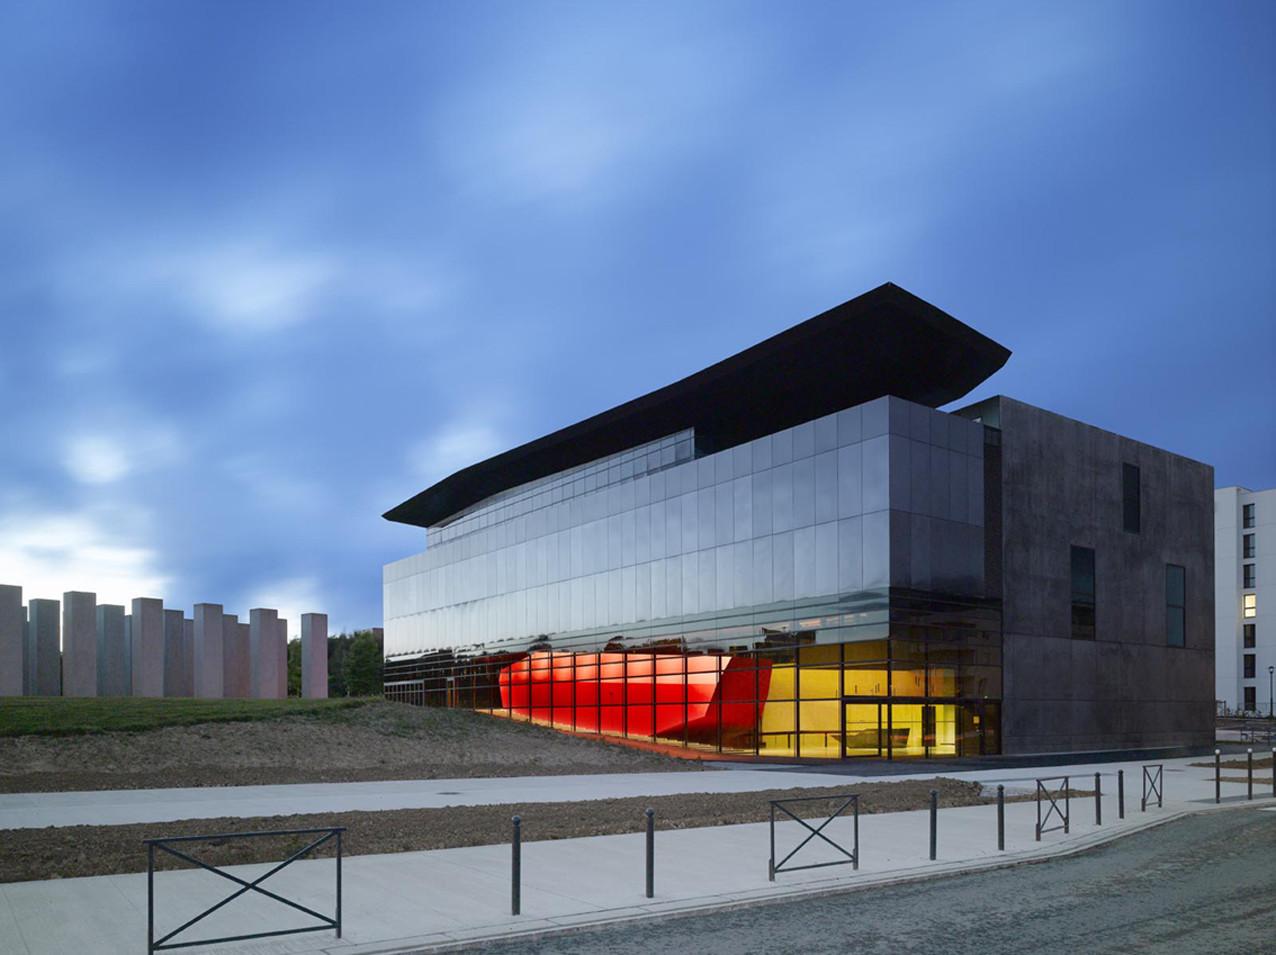 FRAC Bretagne Museum / Studio Odile Decq, © Odile Decq - Roland Halbe